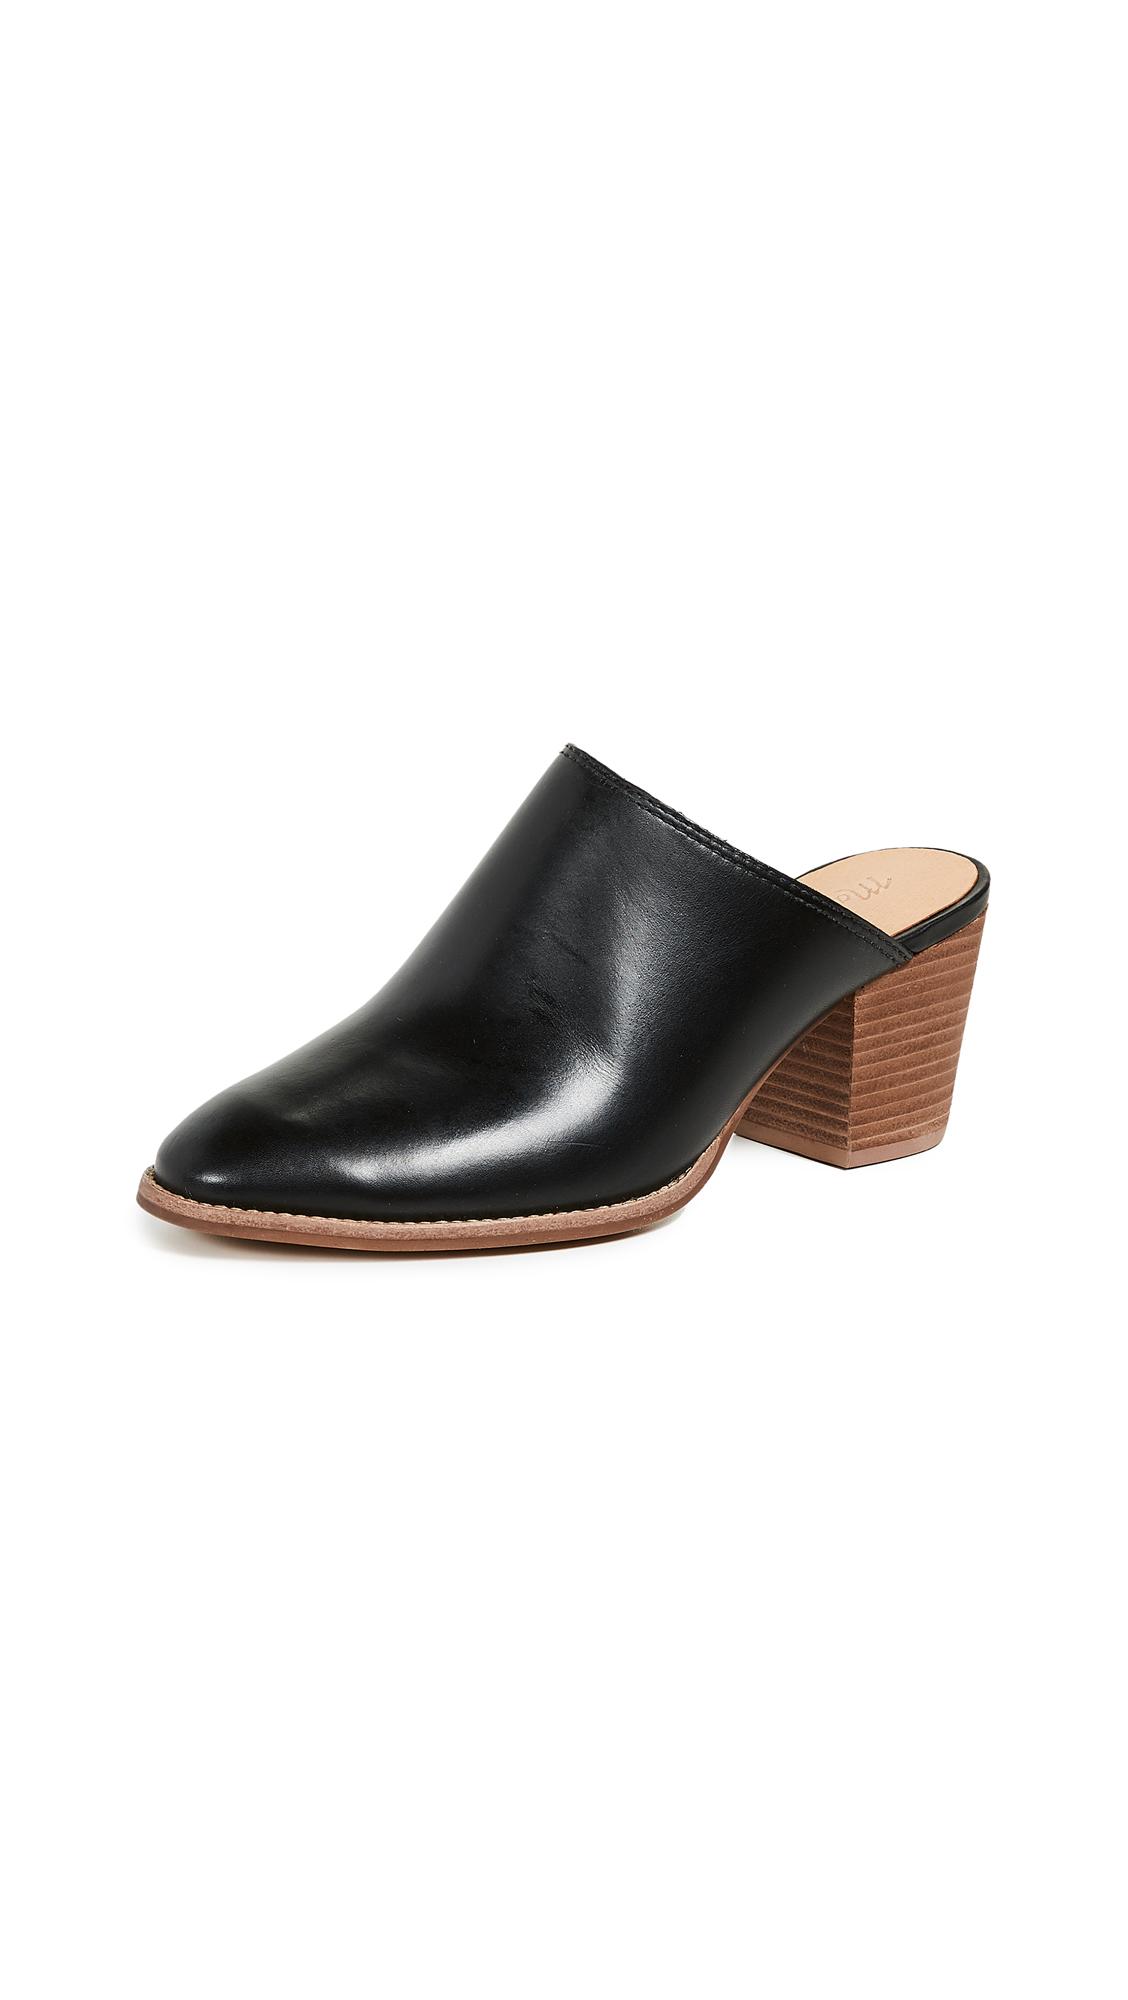 Madewell Harper Block Heel Mules - True Black